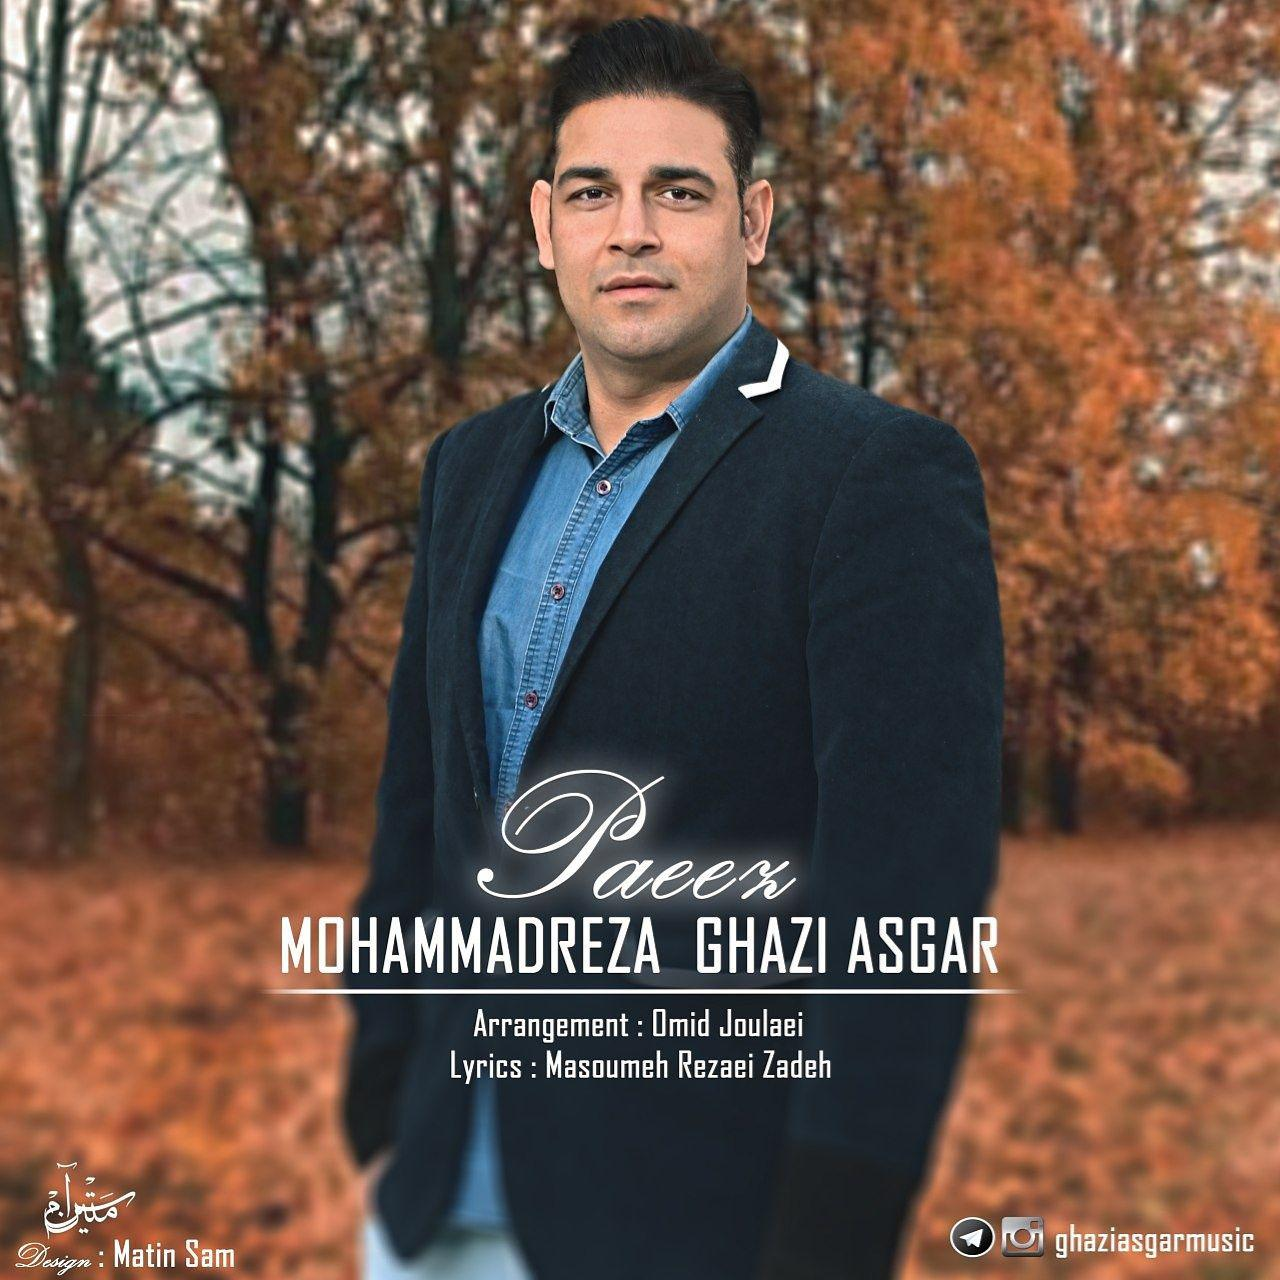 http://dl.rasanejavan.com/RadioJavan%201396/Azar%2096/04/Mohammadreza%20Ghazi%20Asgar%20-%20Paeez.jpg